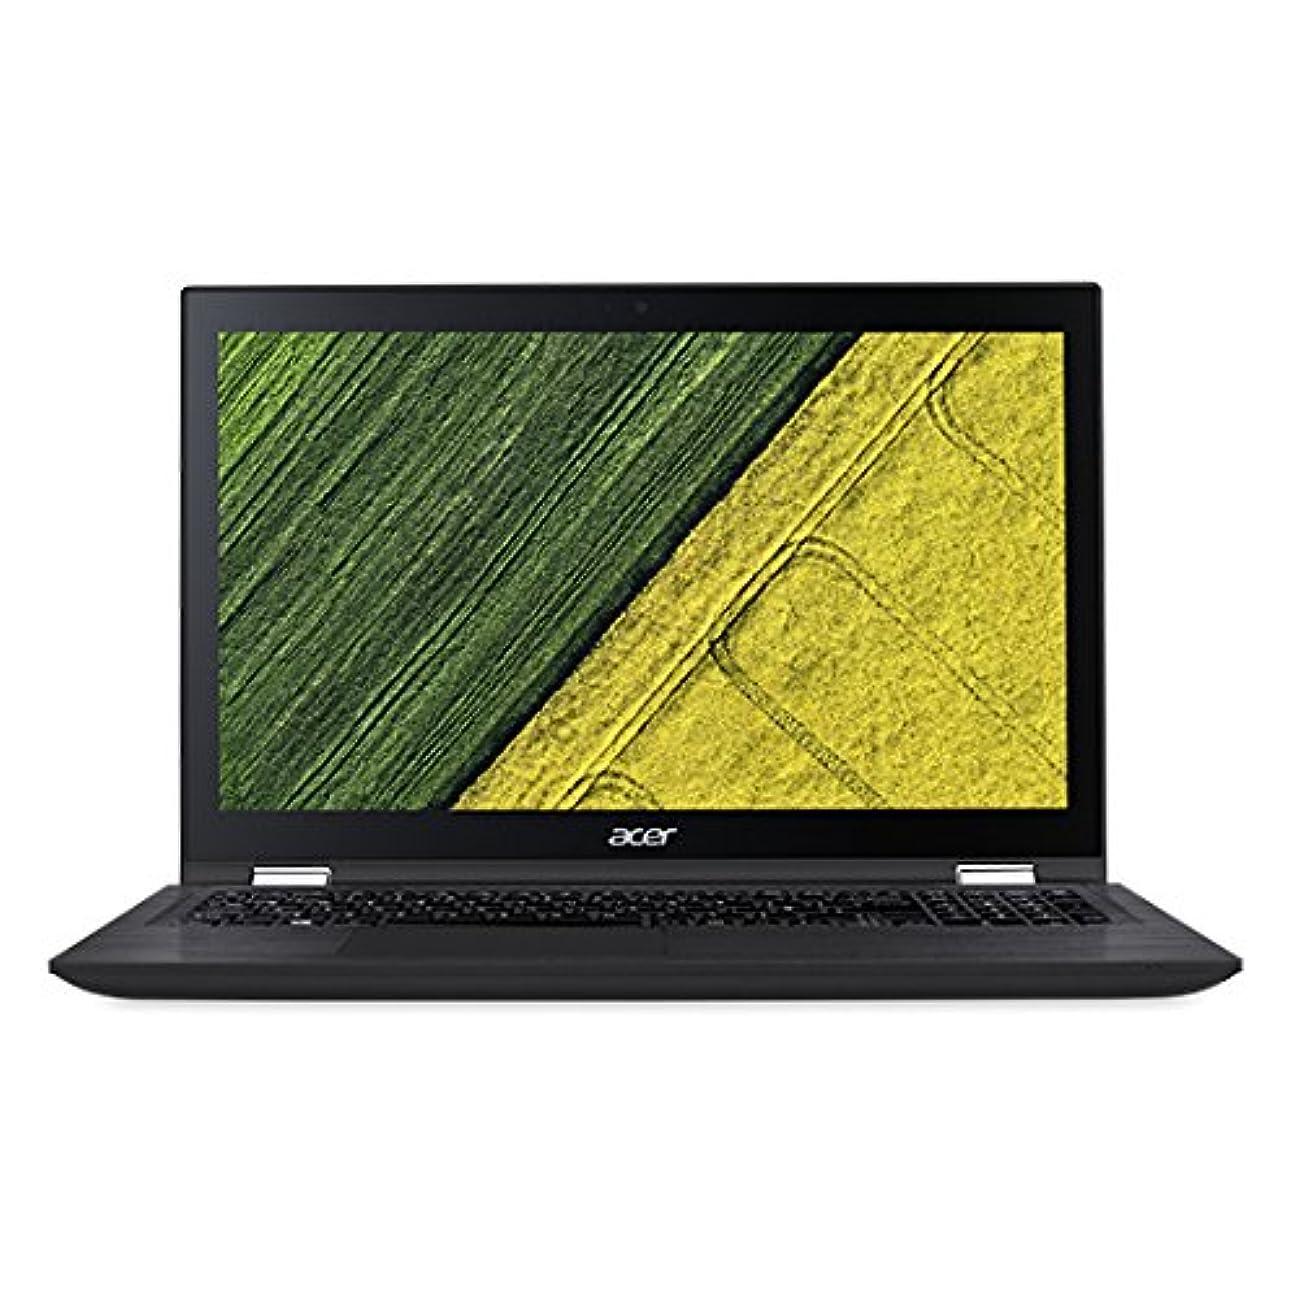 Acer 15.6in Intel Core i7 2.7 GHz 12 GB Ram 1TB HDD Windows 10 Home|SP315-51-757C(Renewed)